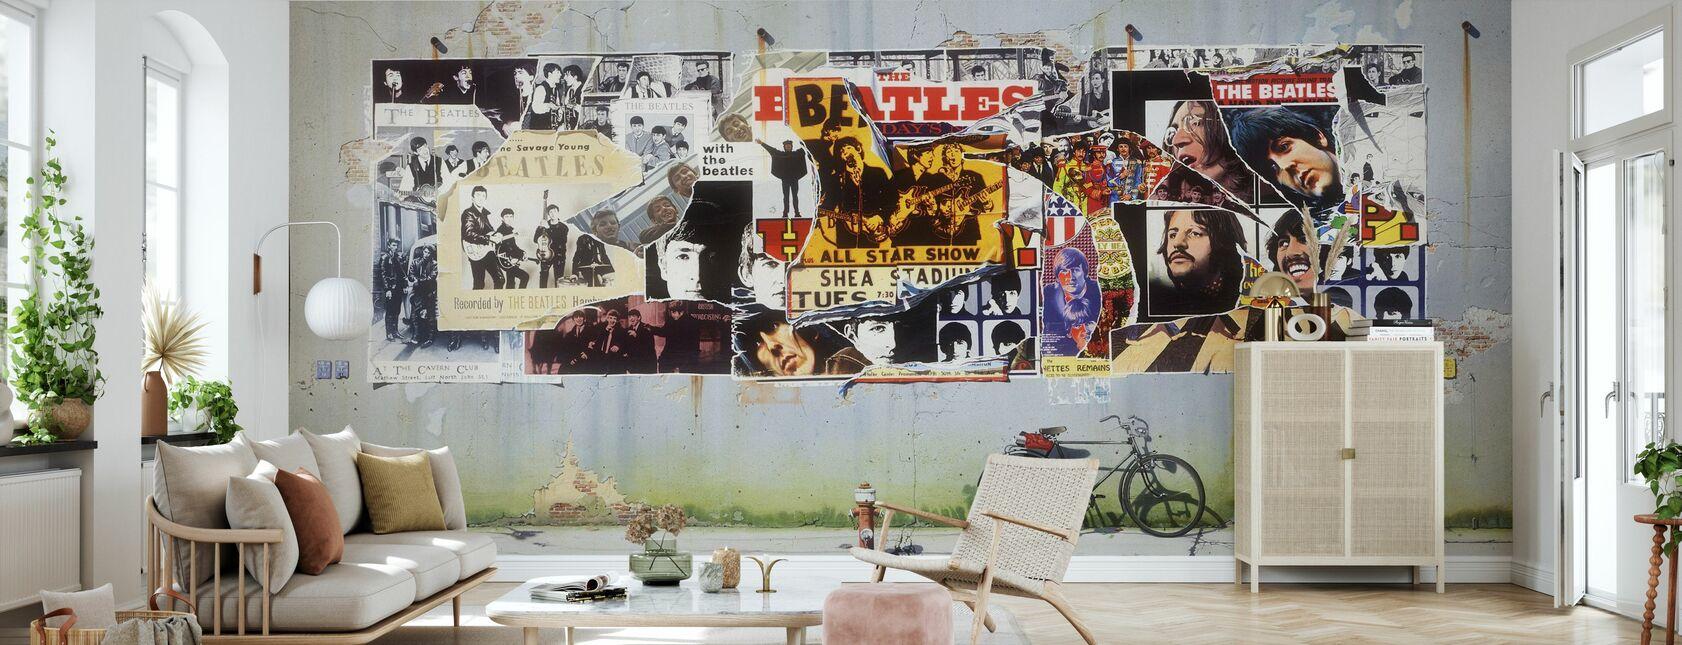 Beatles - Posters op betonnen muur - Behang - Woonkamer